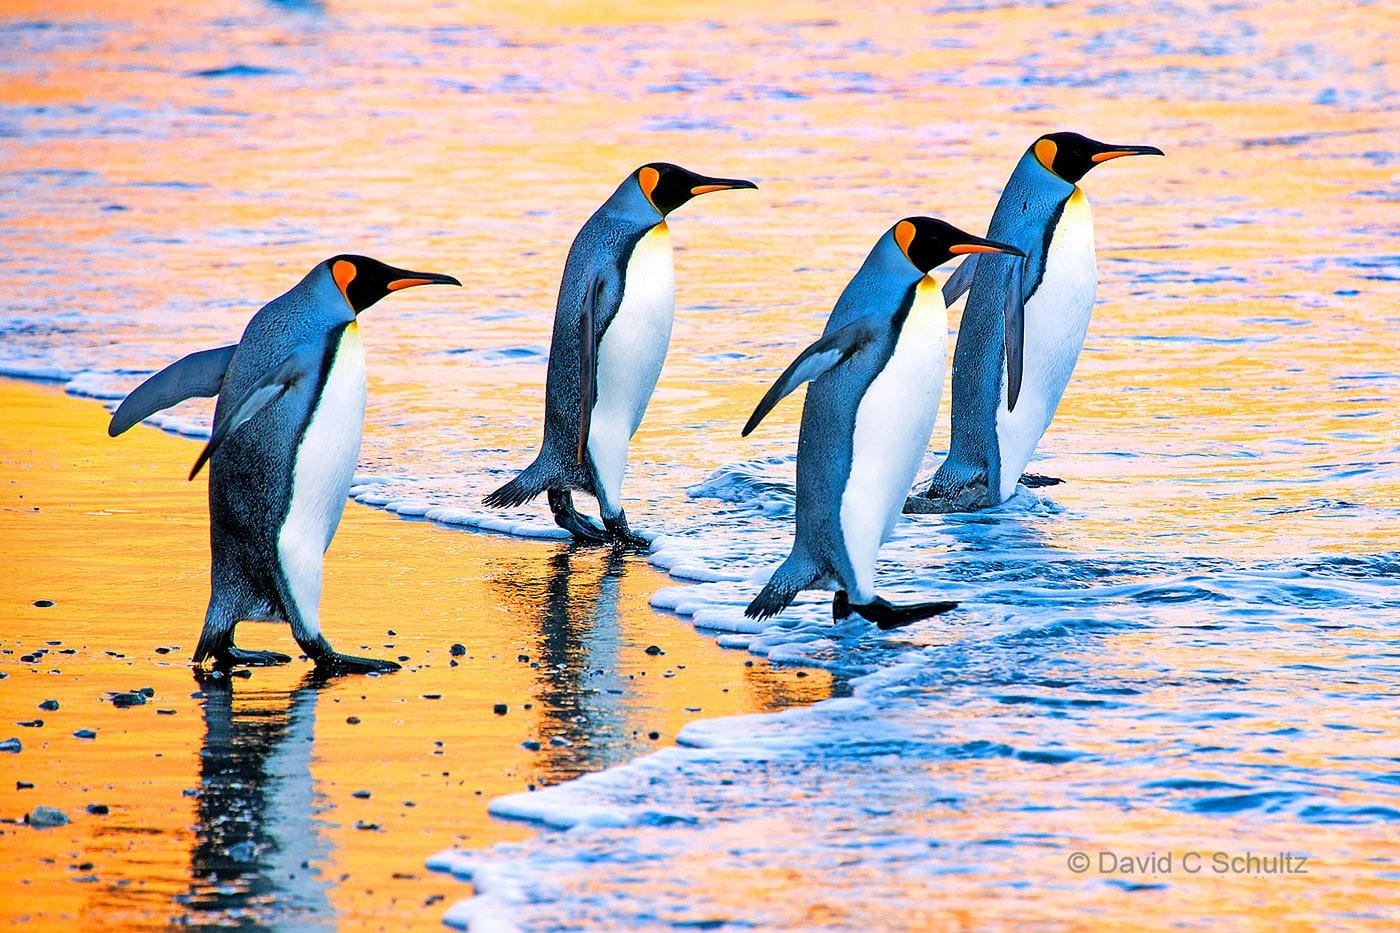 King penguins on South Georgia Island - Image #163-1553